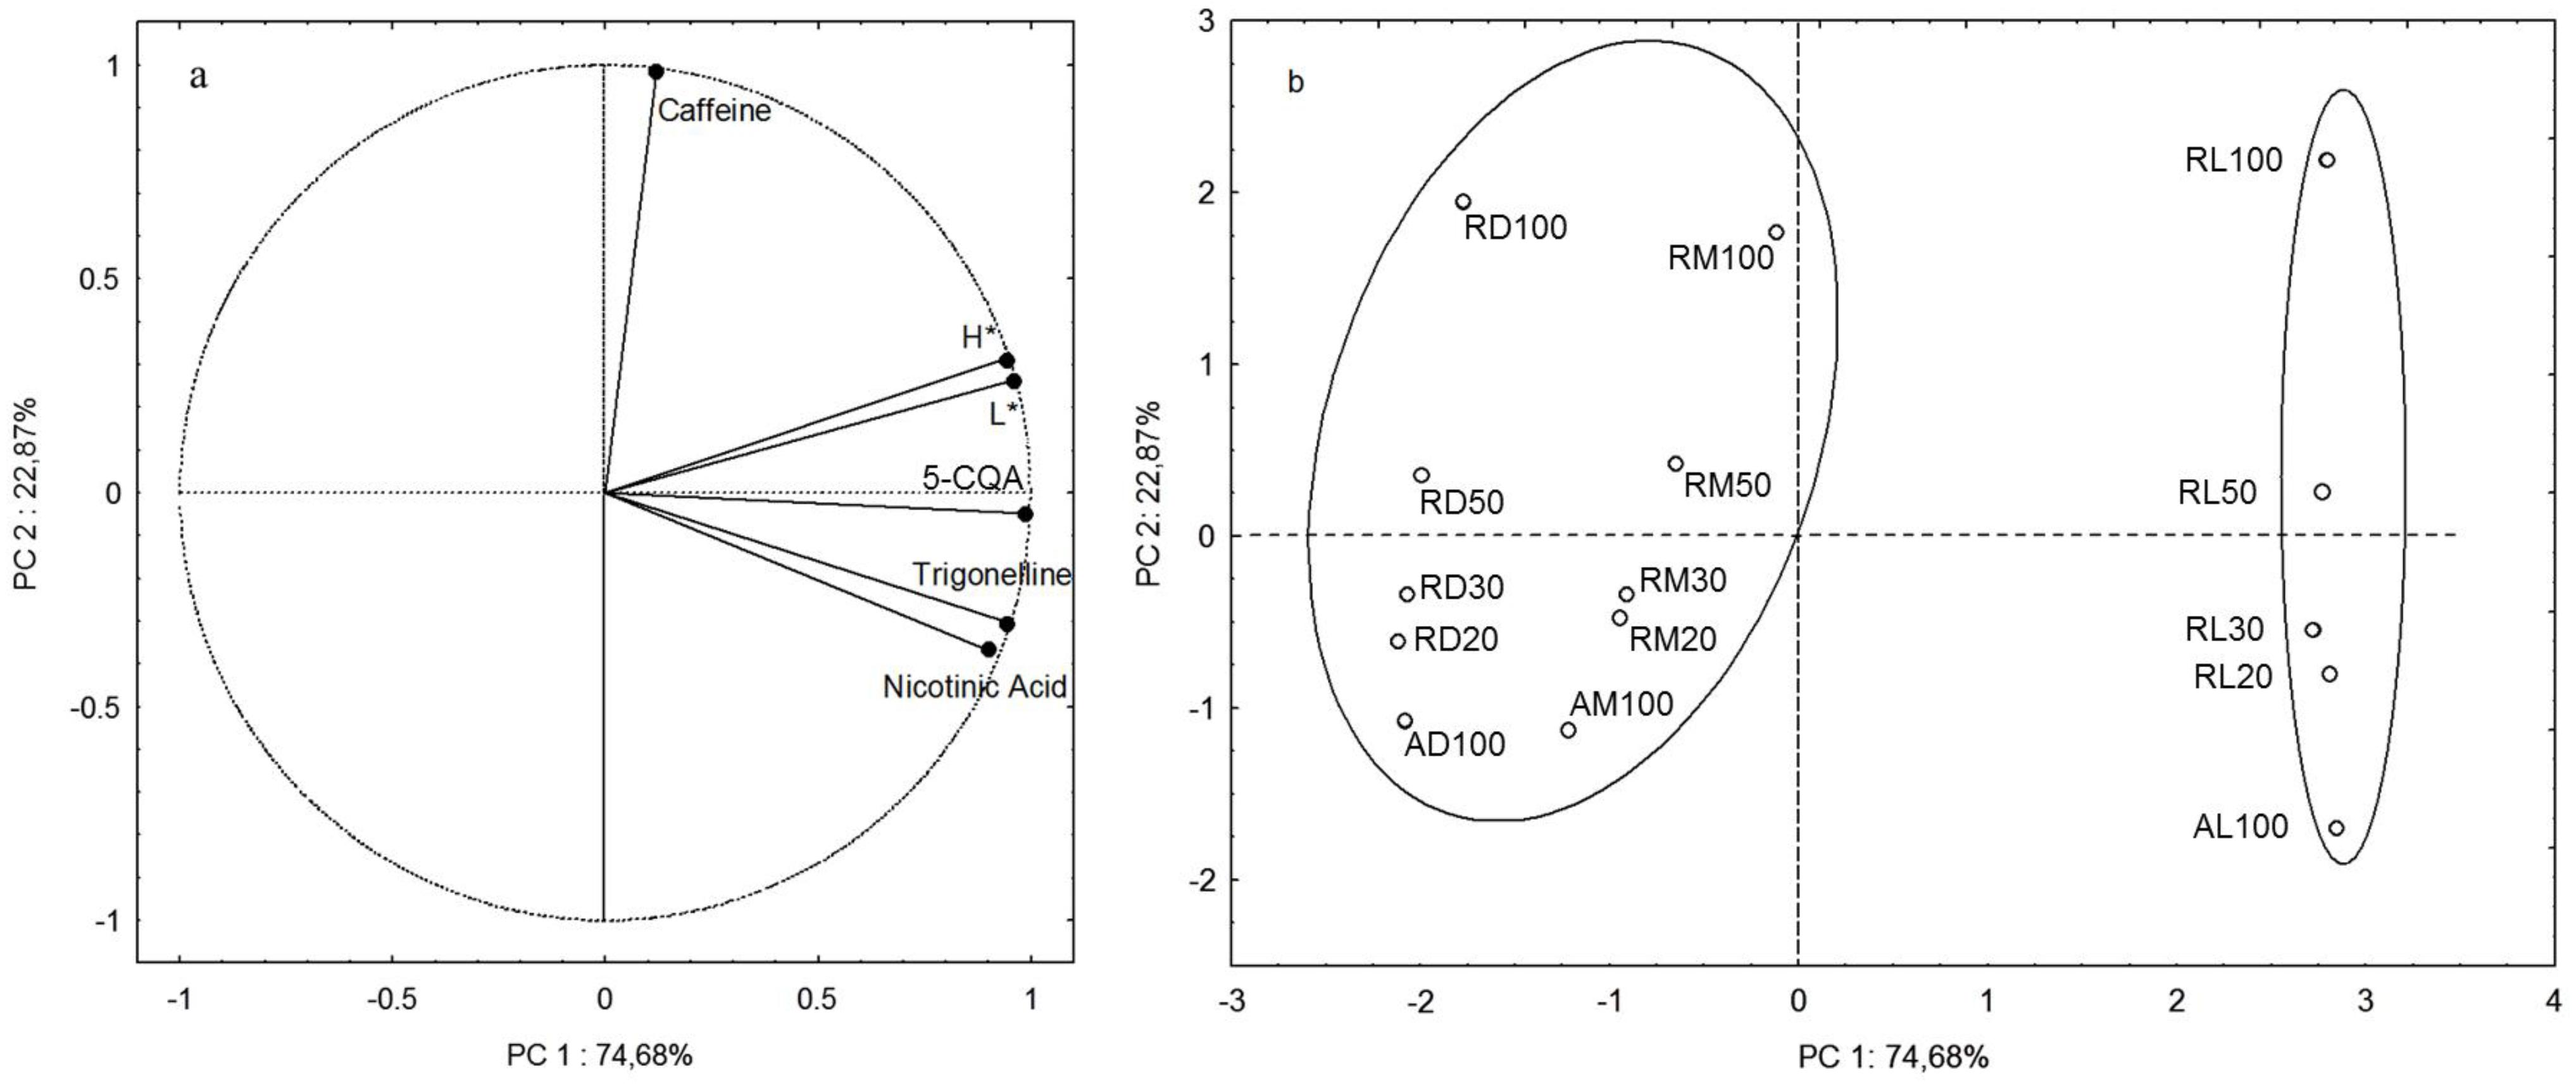 principal component analysis example